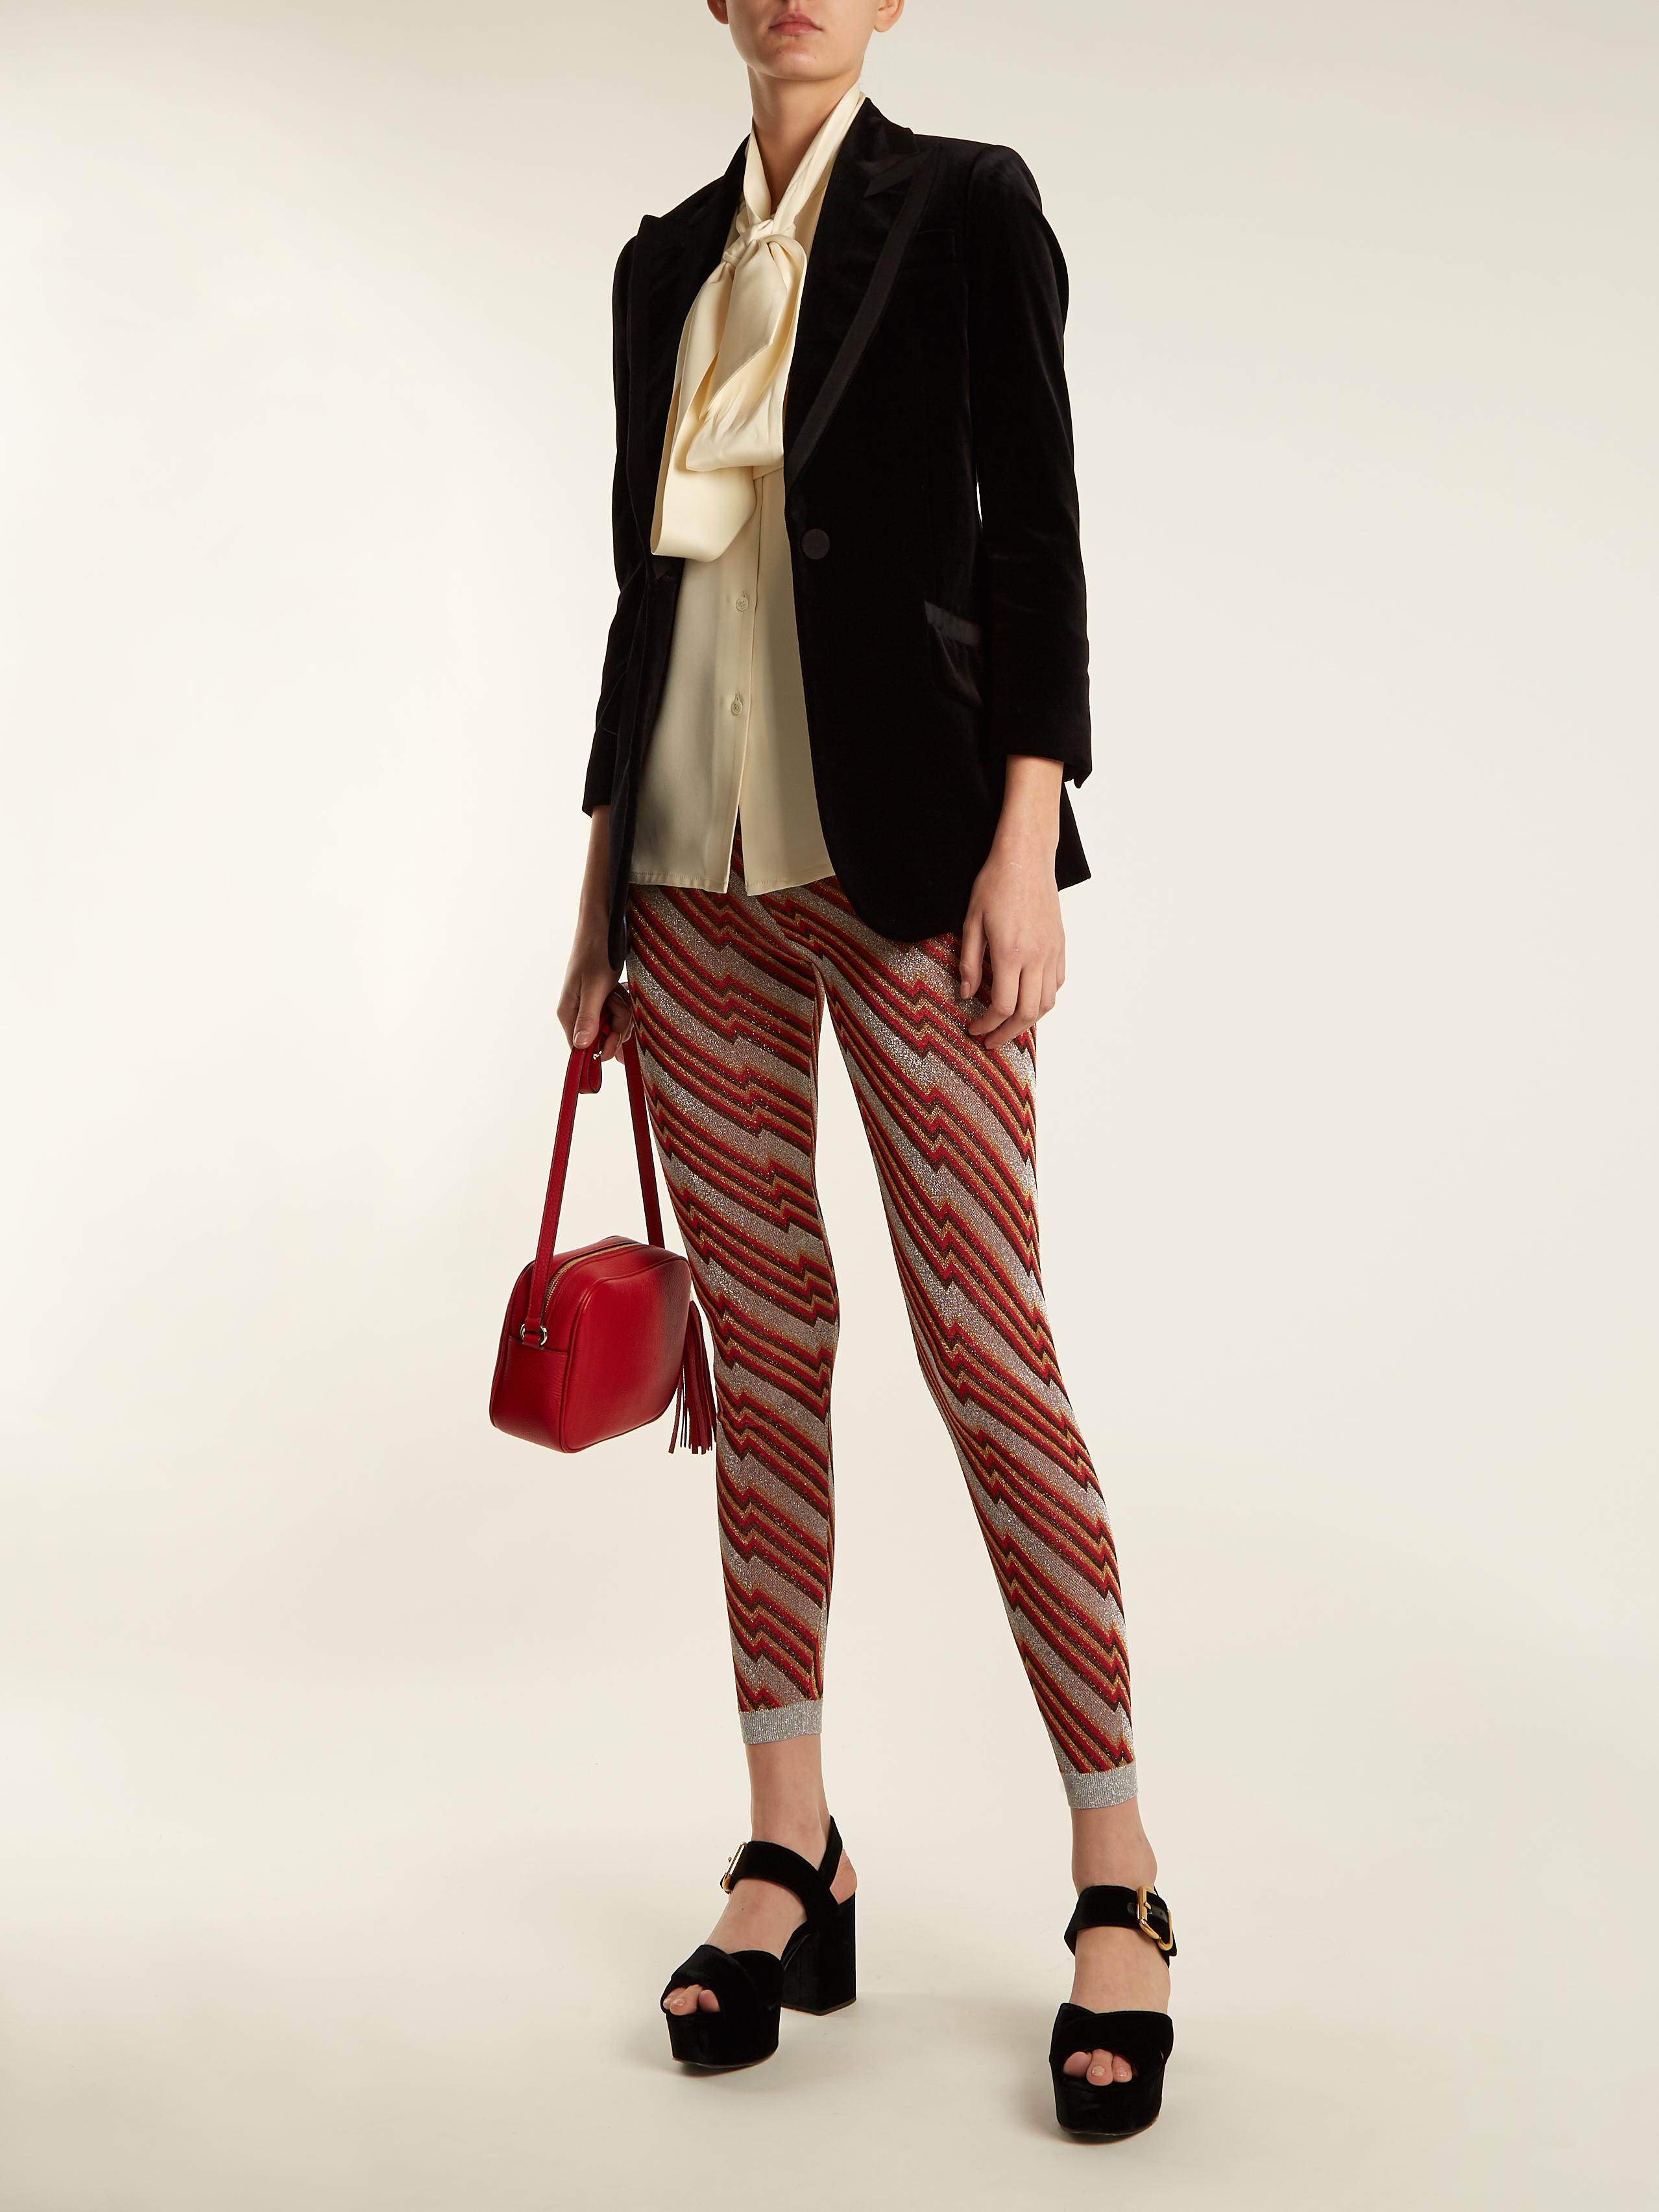 85abea0a23af https   www.lyst.com clothing gucci-diagonal-jacquard-leggings  2018 ...